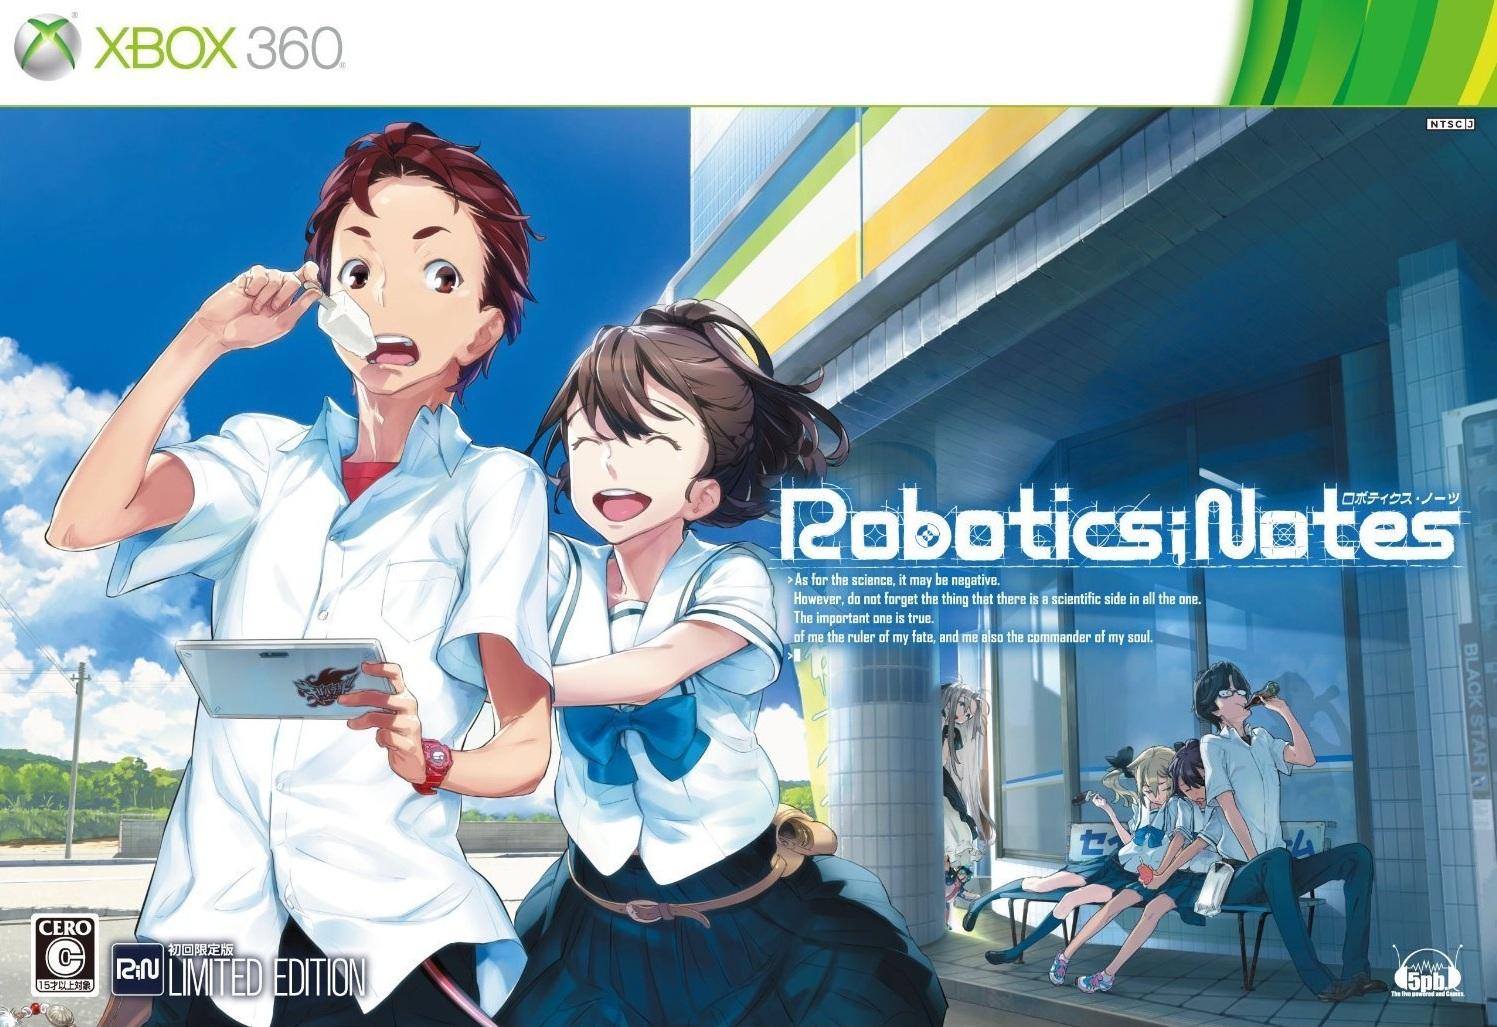 Sakura S Blog Robotics Notes Impressions Spoiler Free